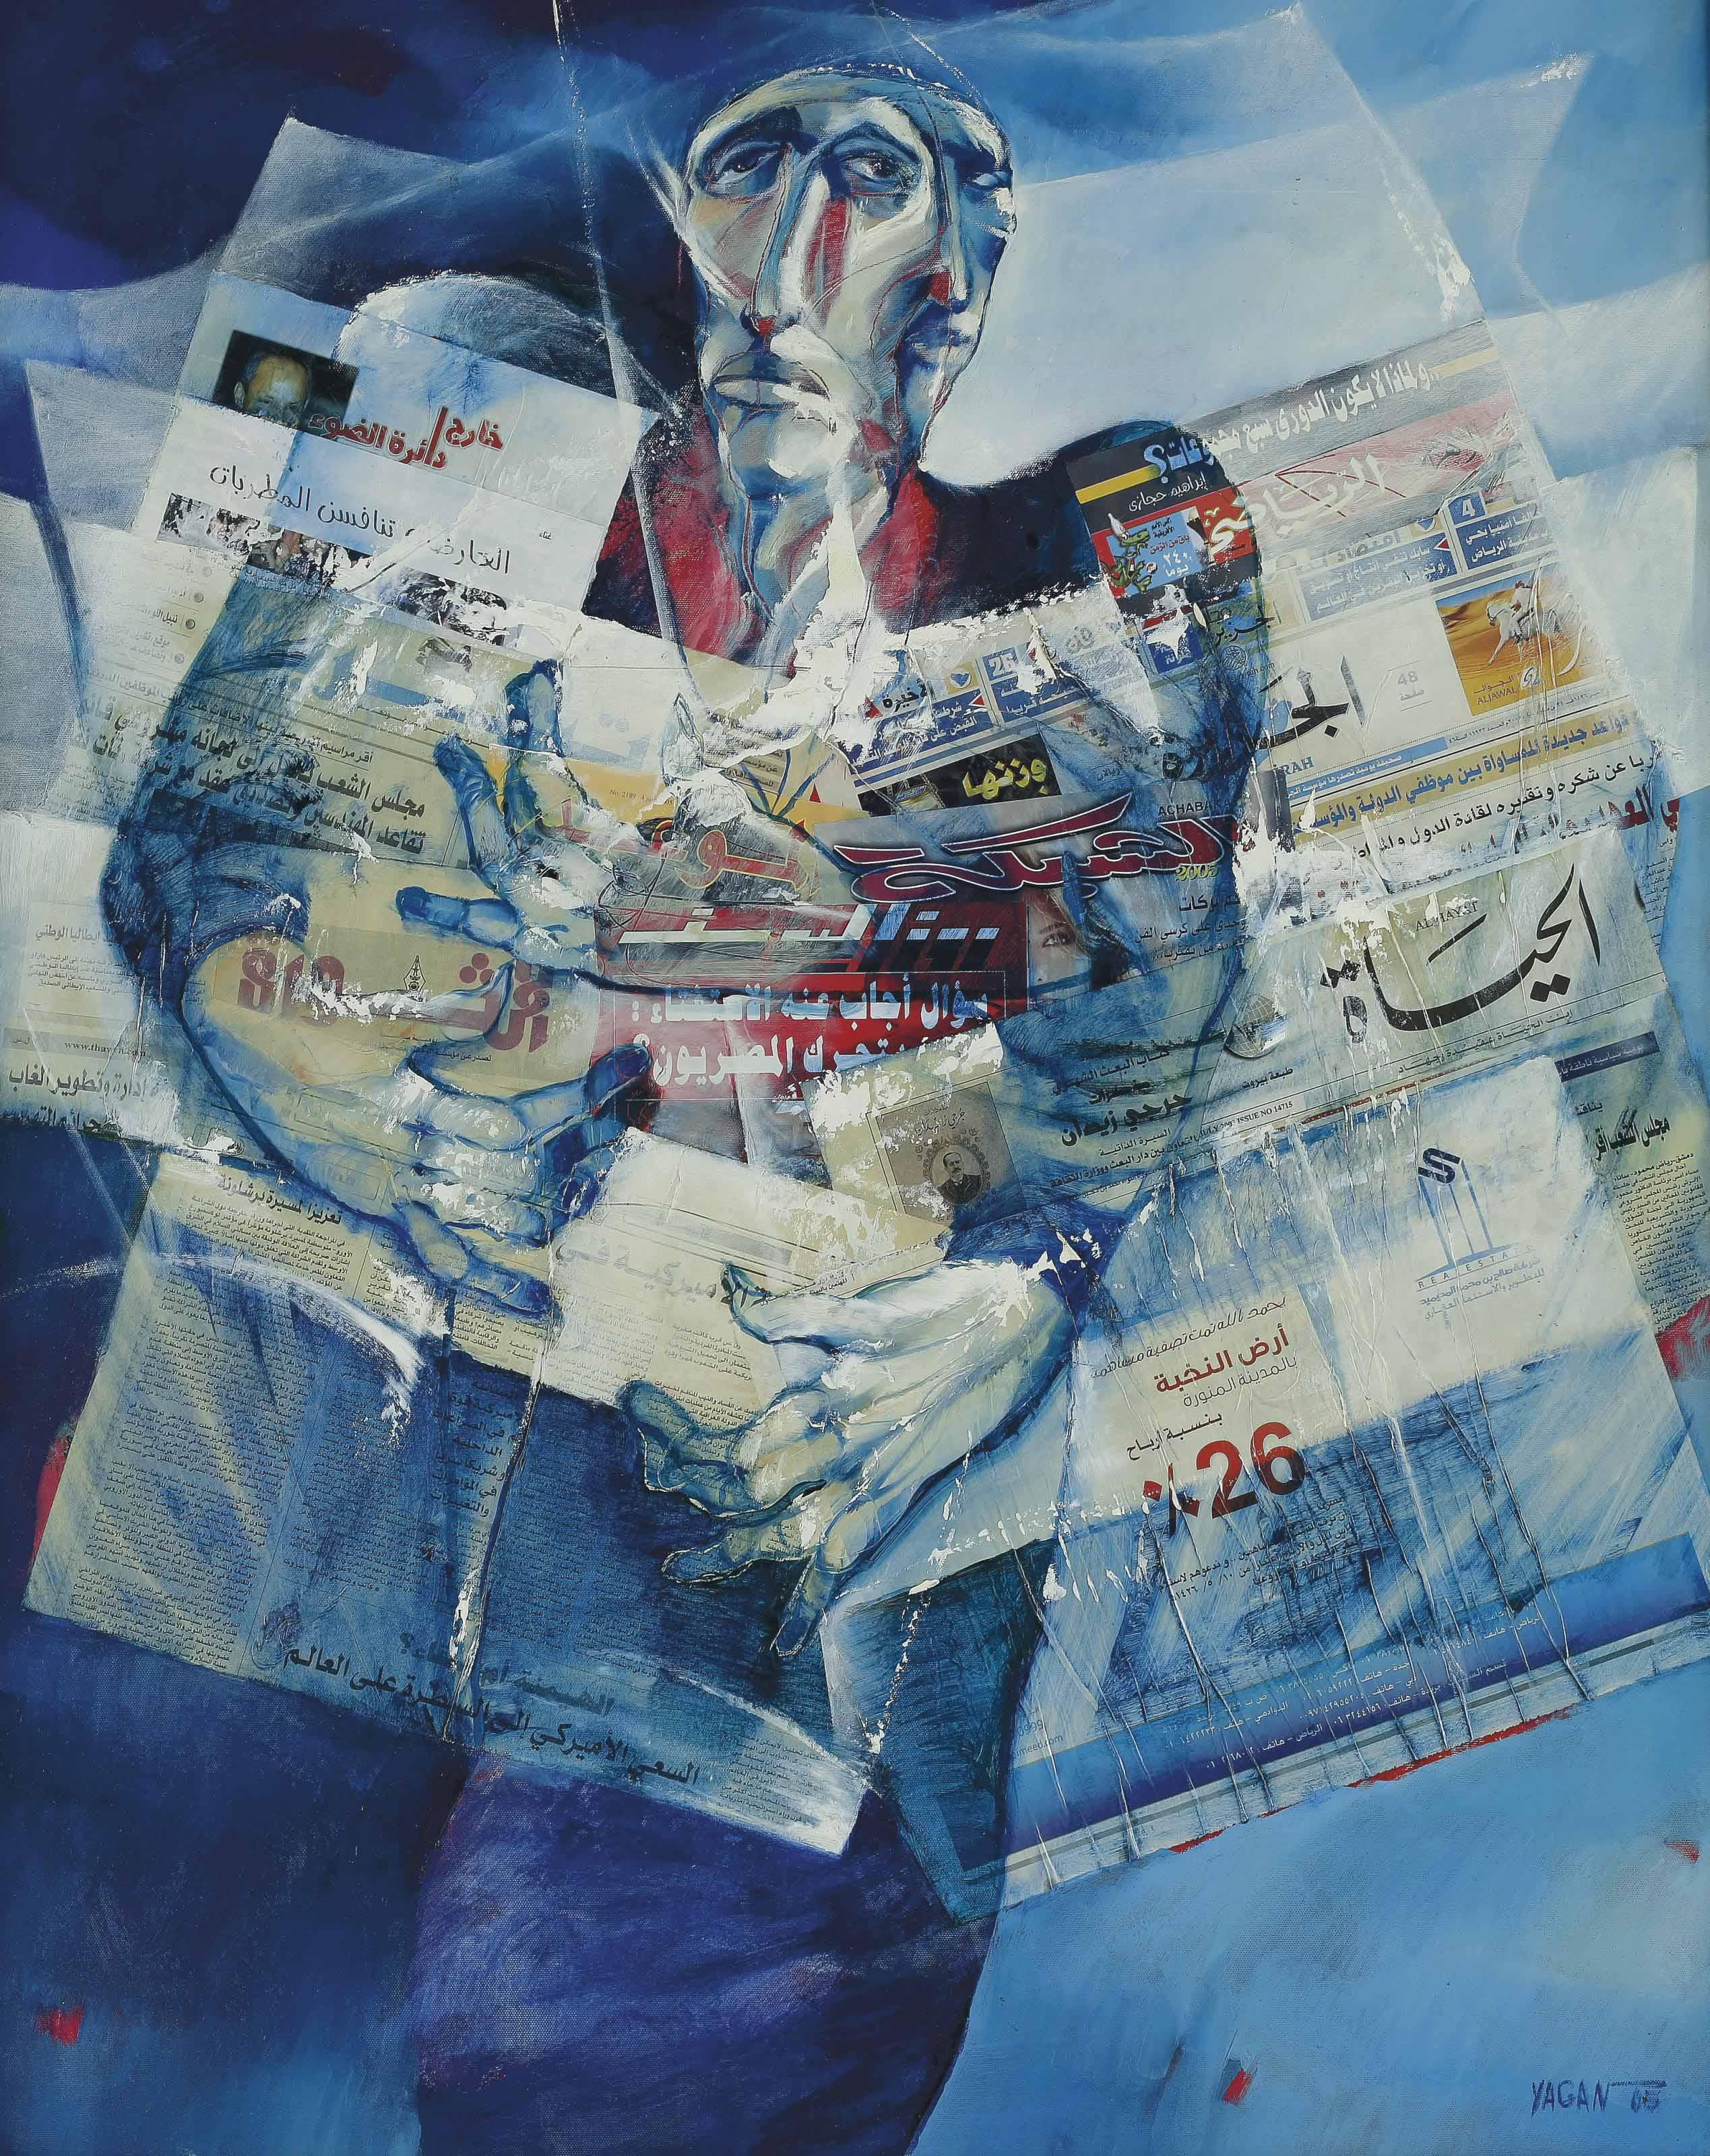 Bayaa' al Jara'id Abou Hosn (The Newspaper Seller Abou Hosn)